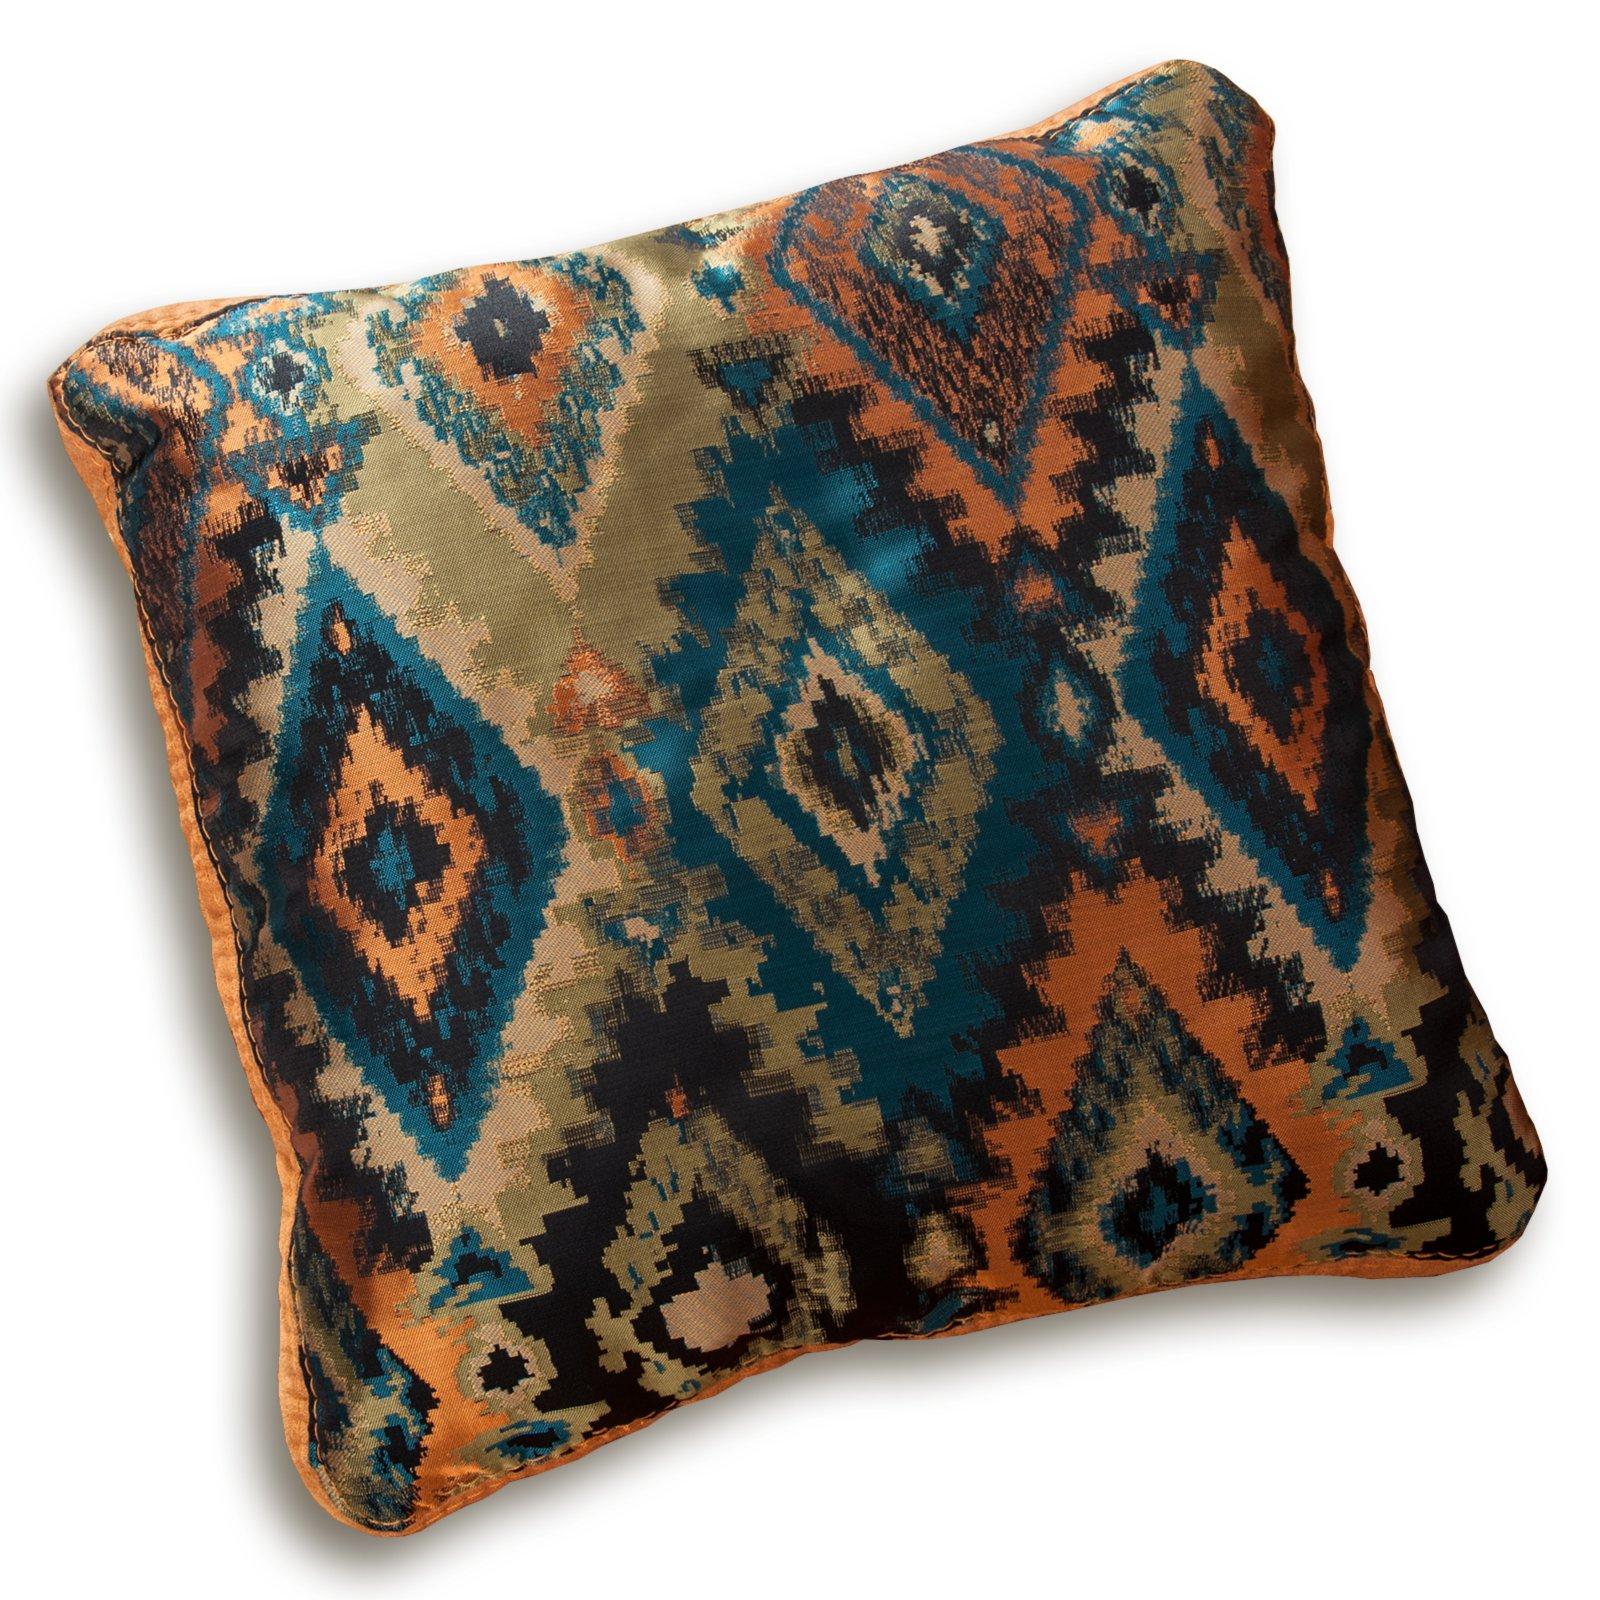 kissen blau orange 55x55 cm m belhaus roller. Black Bedroom Furniture Sets. Home Design Ideas